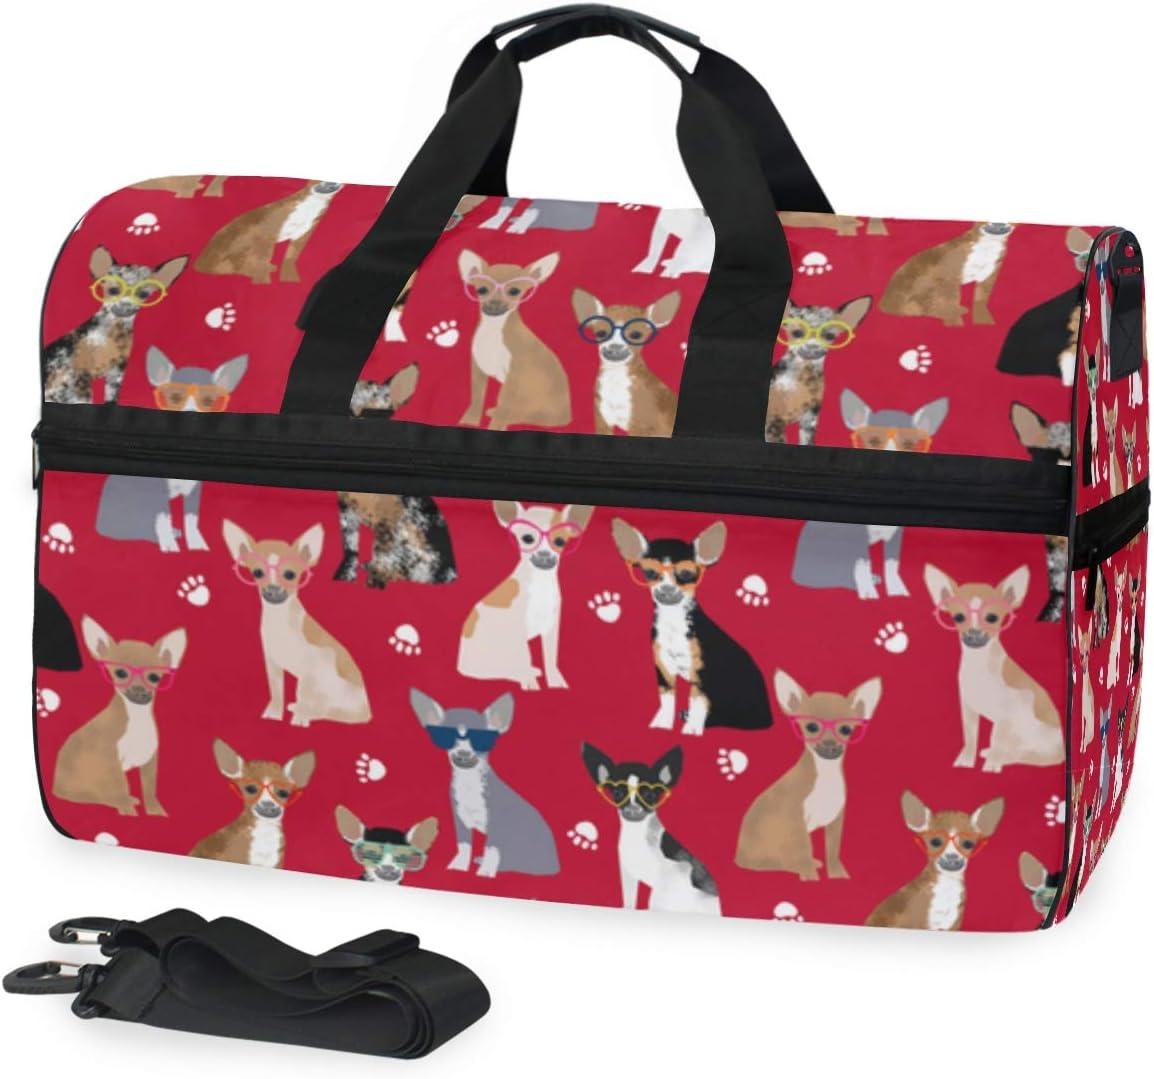 Lightweight Large Capacity Portable Luggage Bag Cloud Animal Deer Travel Duffel Bag Backpack